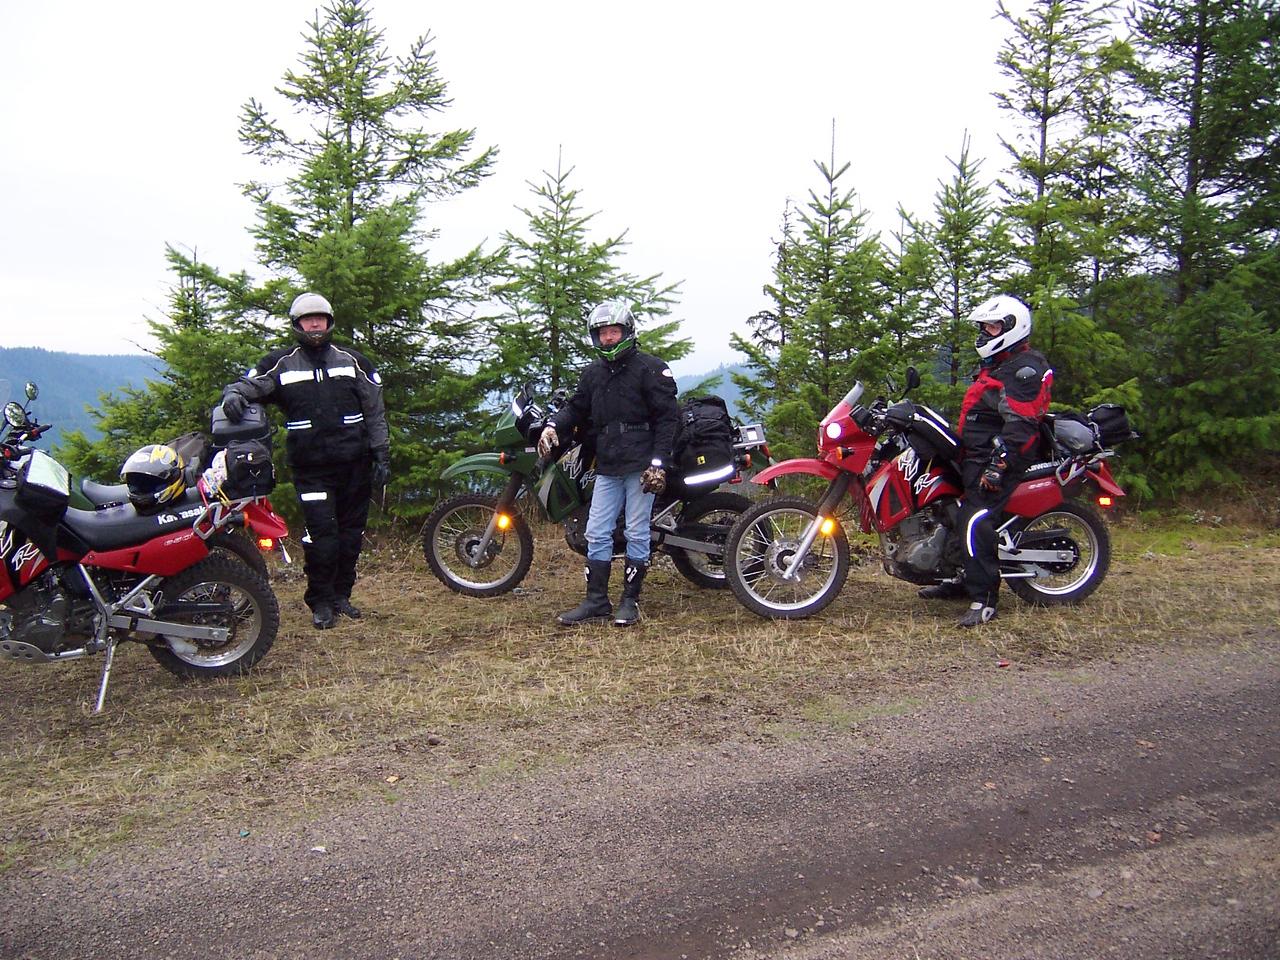 KLR 650's